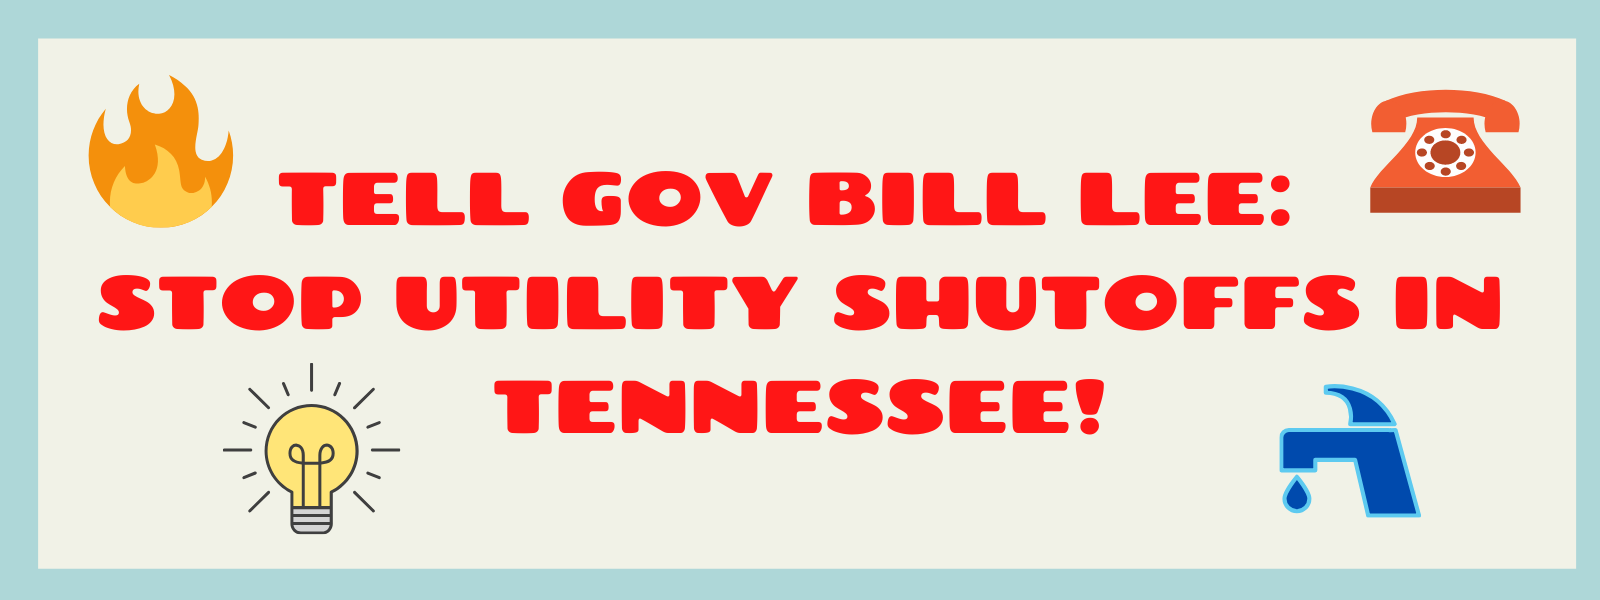 Tell_bill_lee__stop_utilty_shutoffs_in_tennessee!_(2)